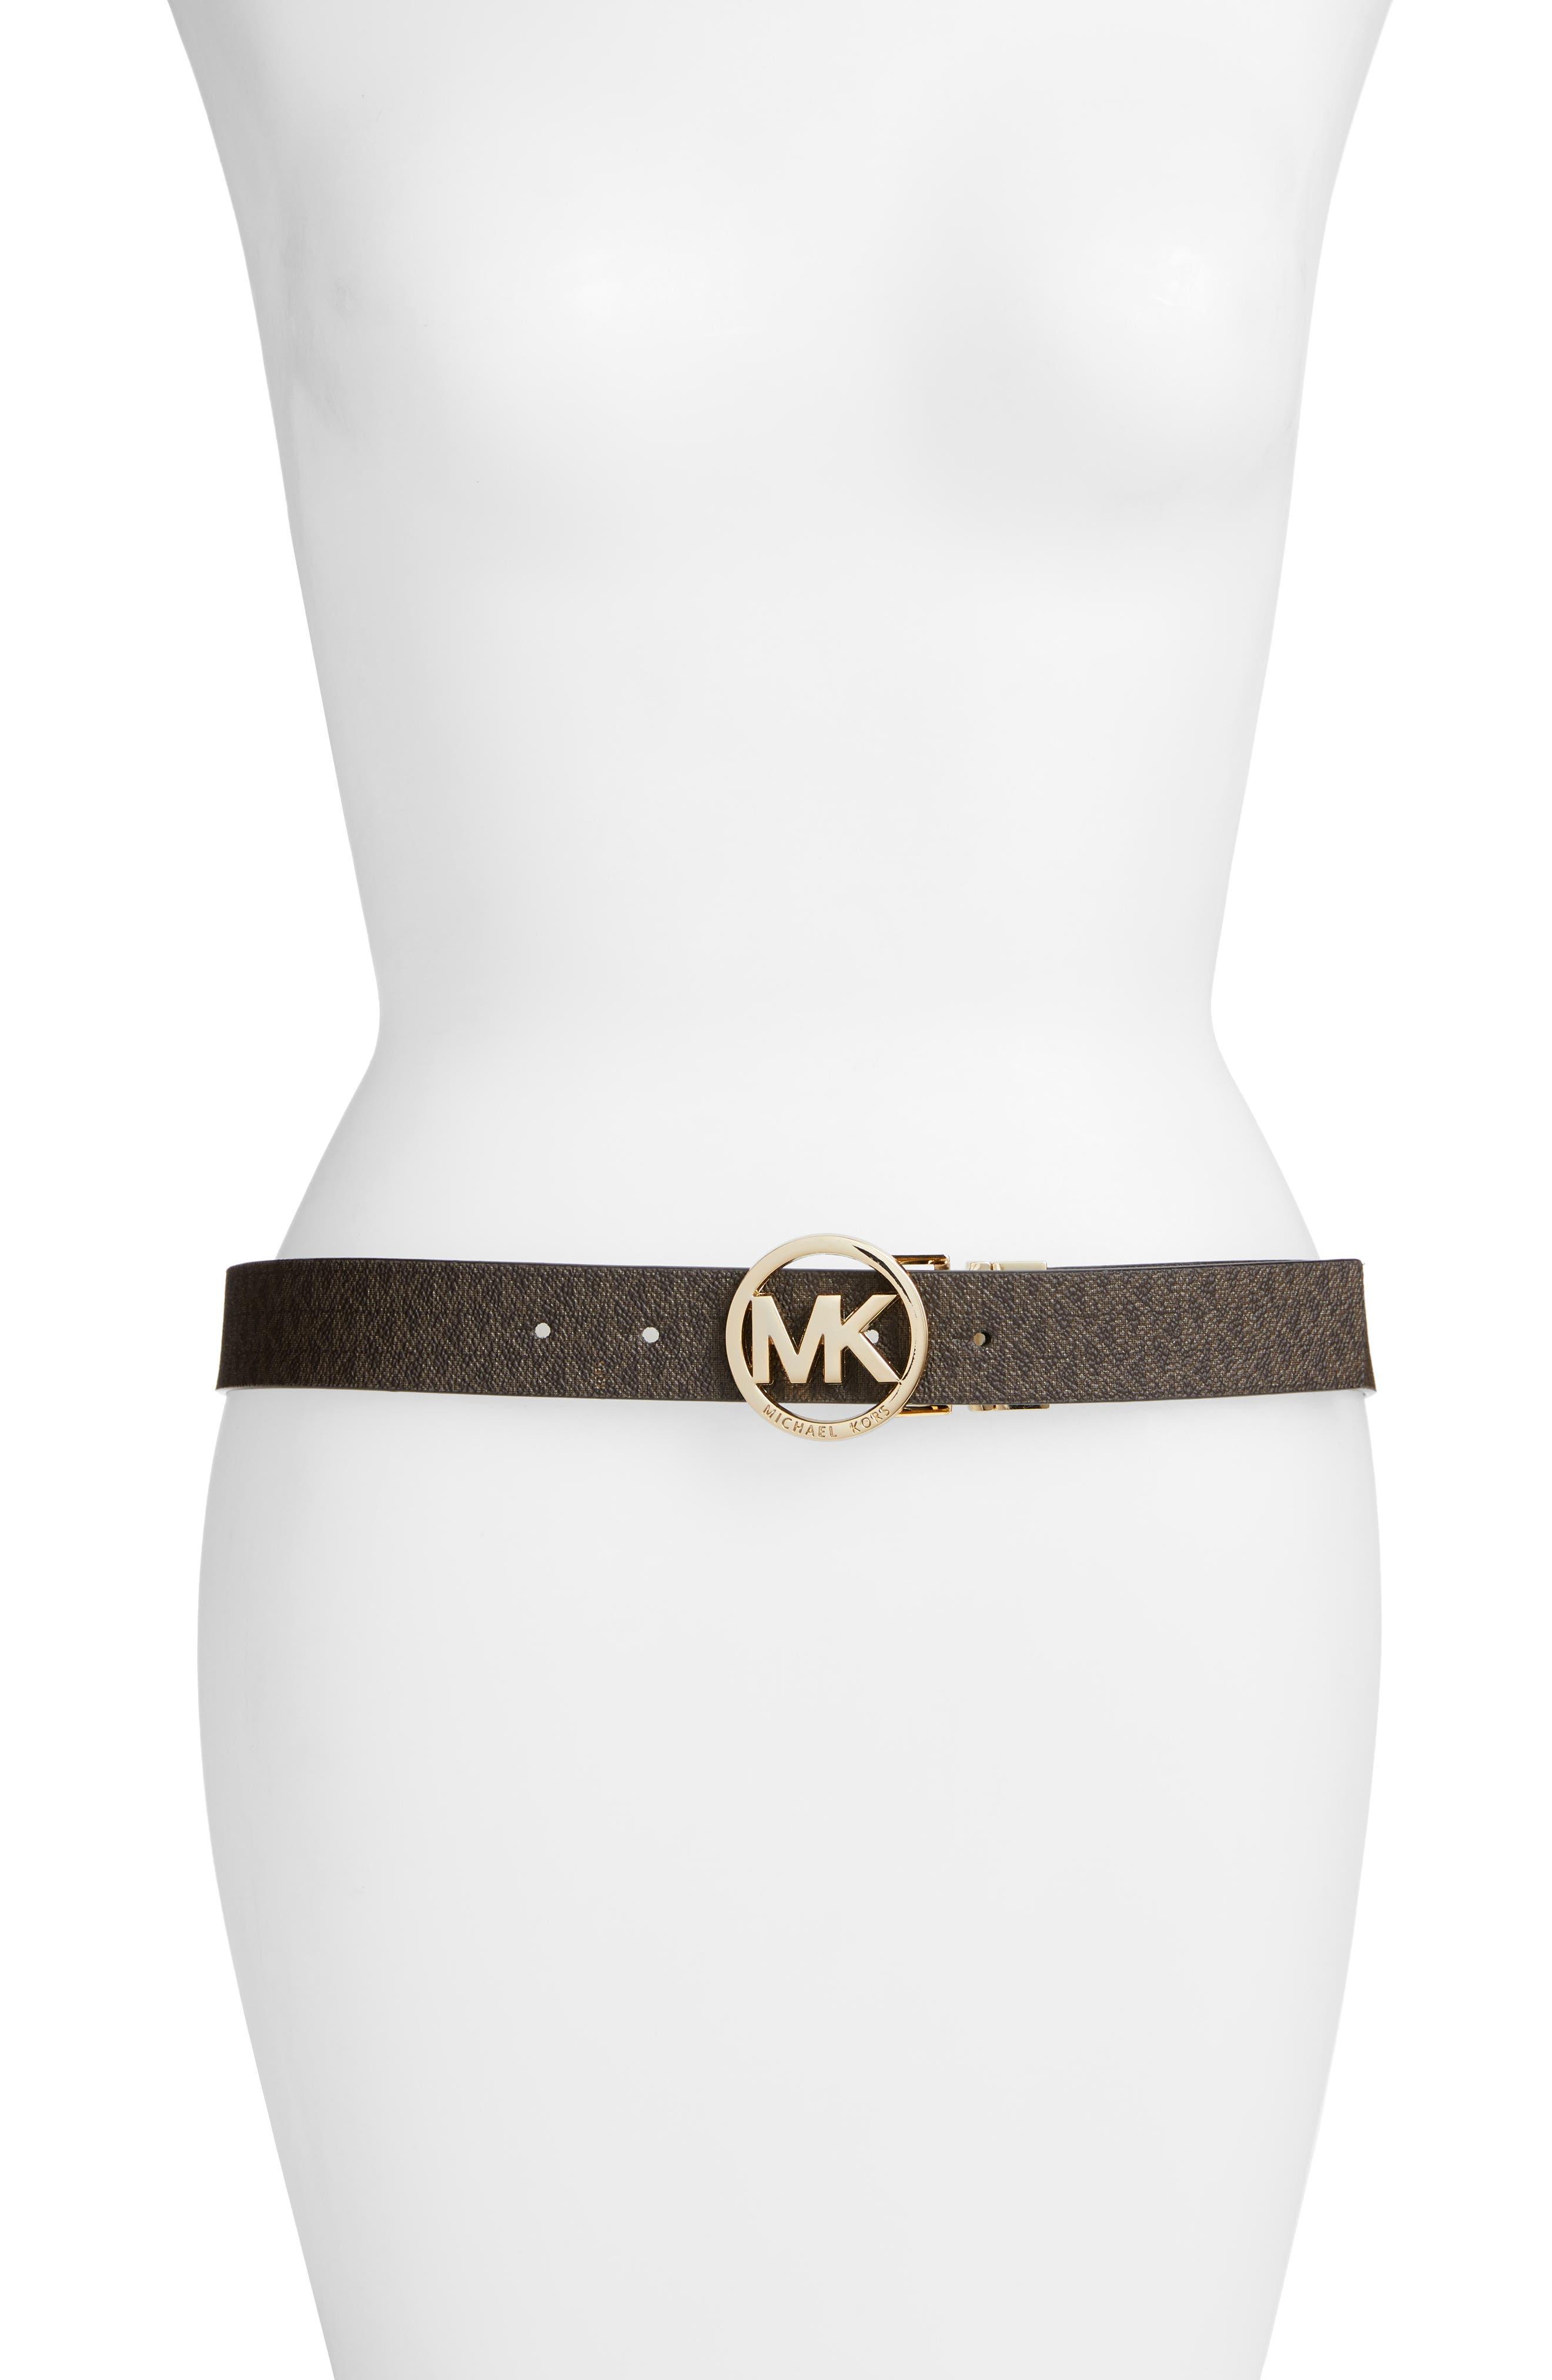 MICHAEL MICHAEL KORS Logo Reversible Leather Belt, Main, color, CHOCOLATE/ BLACK